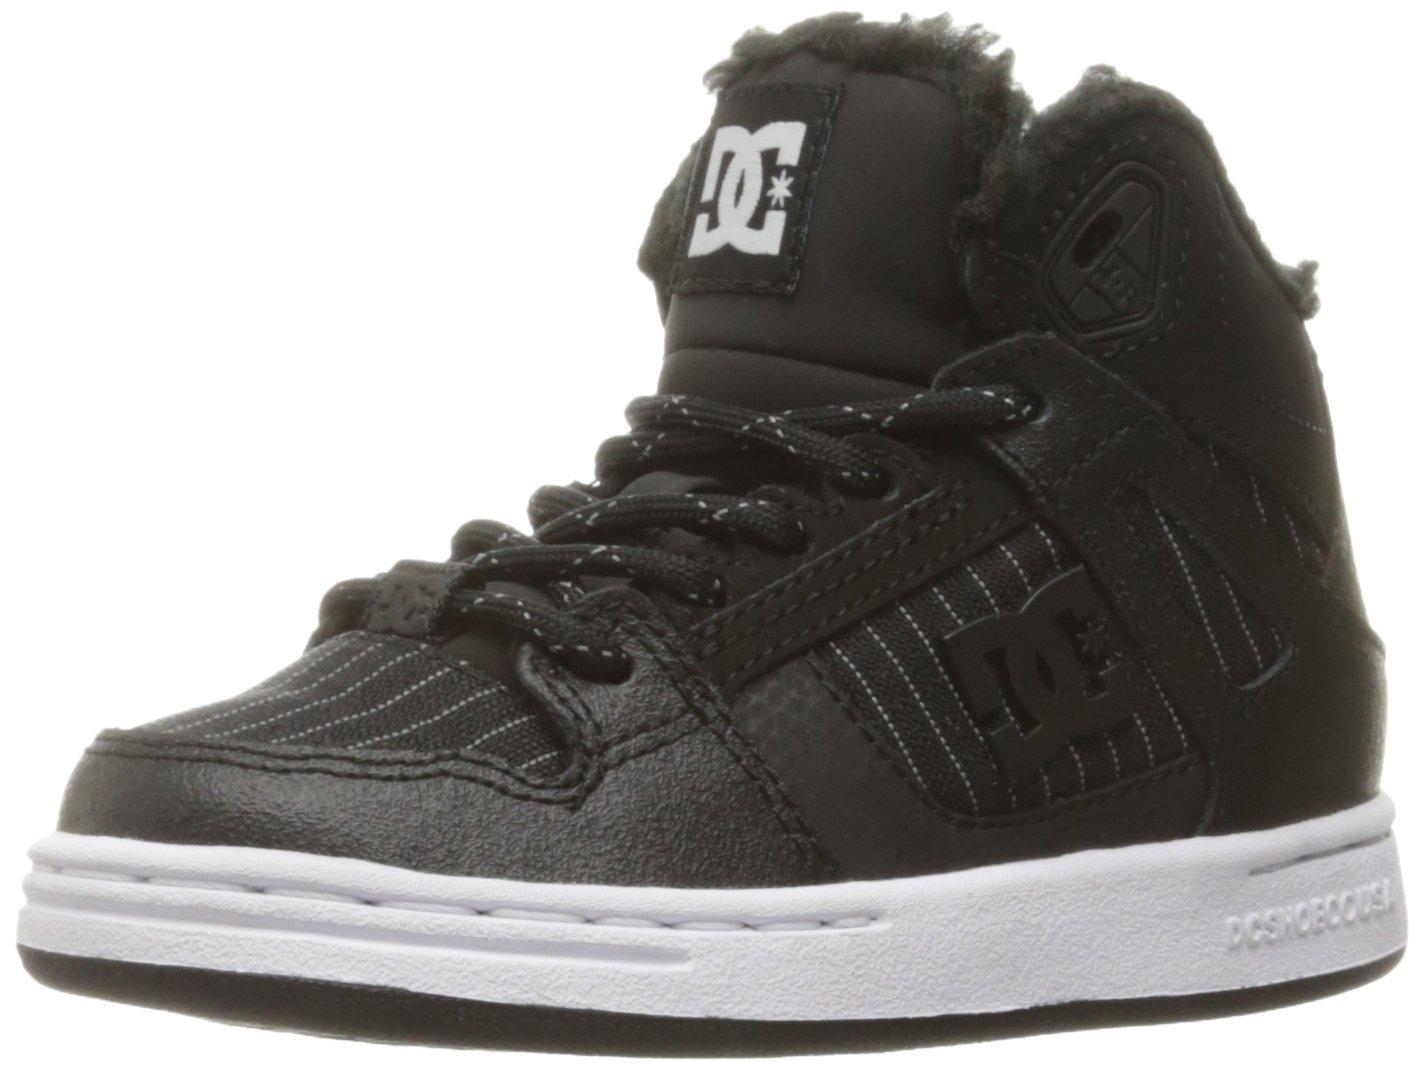 DC Boys Youth Rebound Wnt High Top Skate Shoes Sneaker Black/White, 11 M US Little Kid